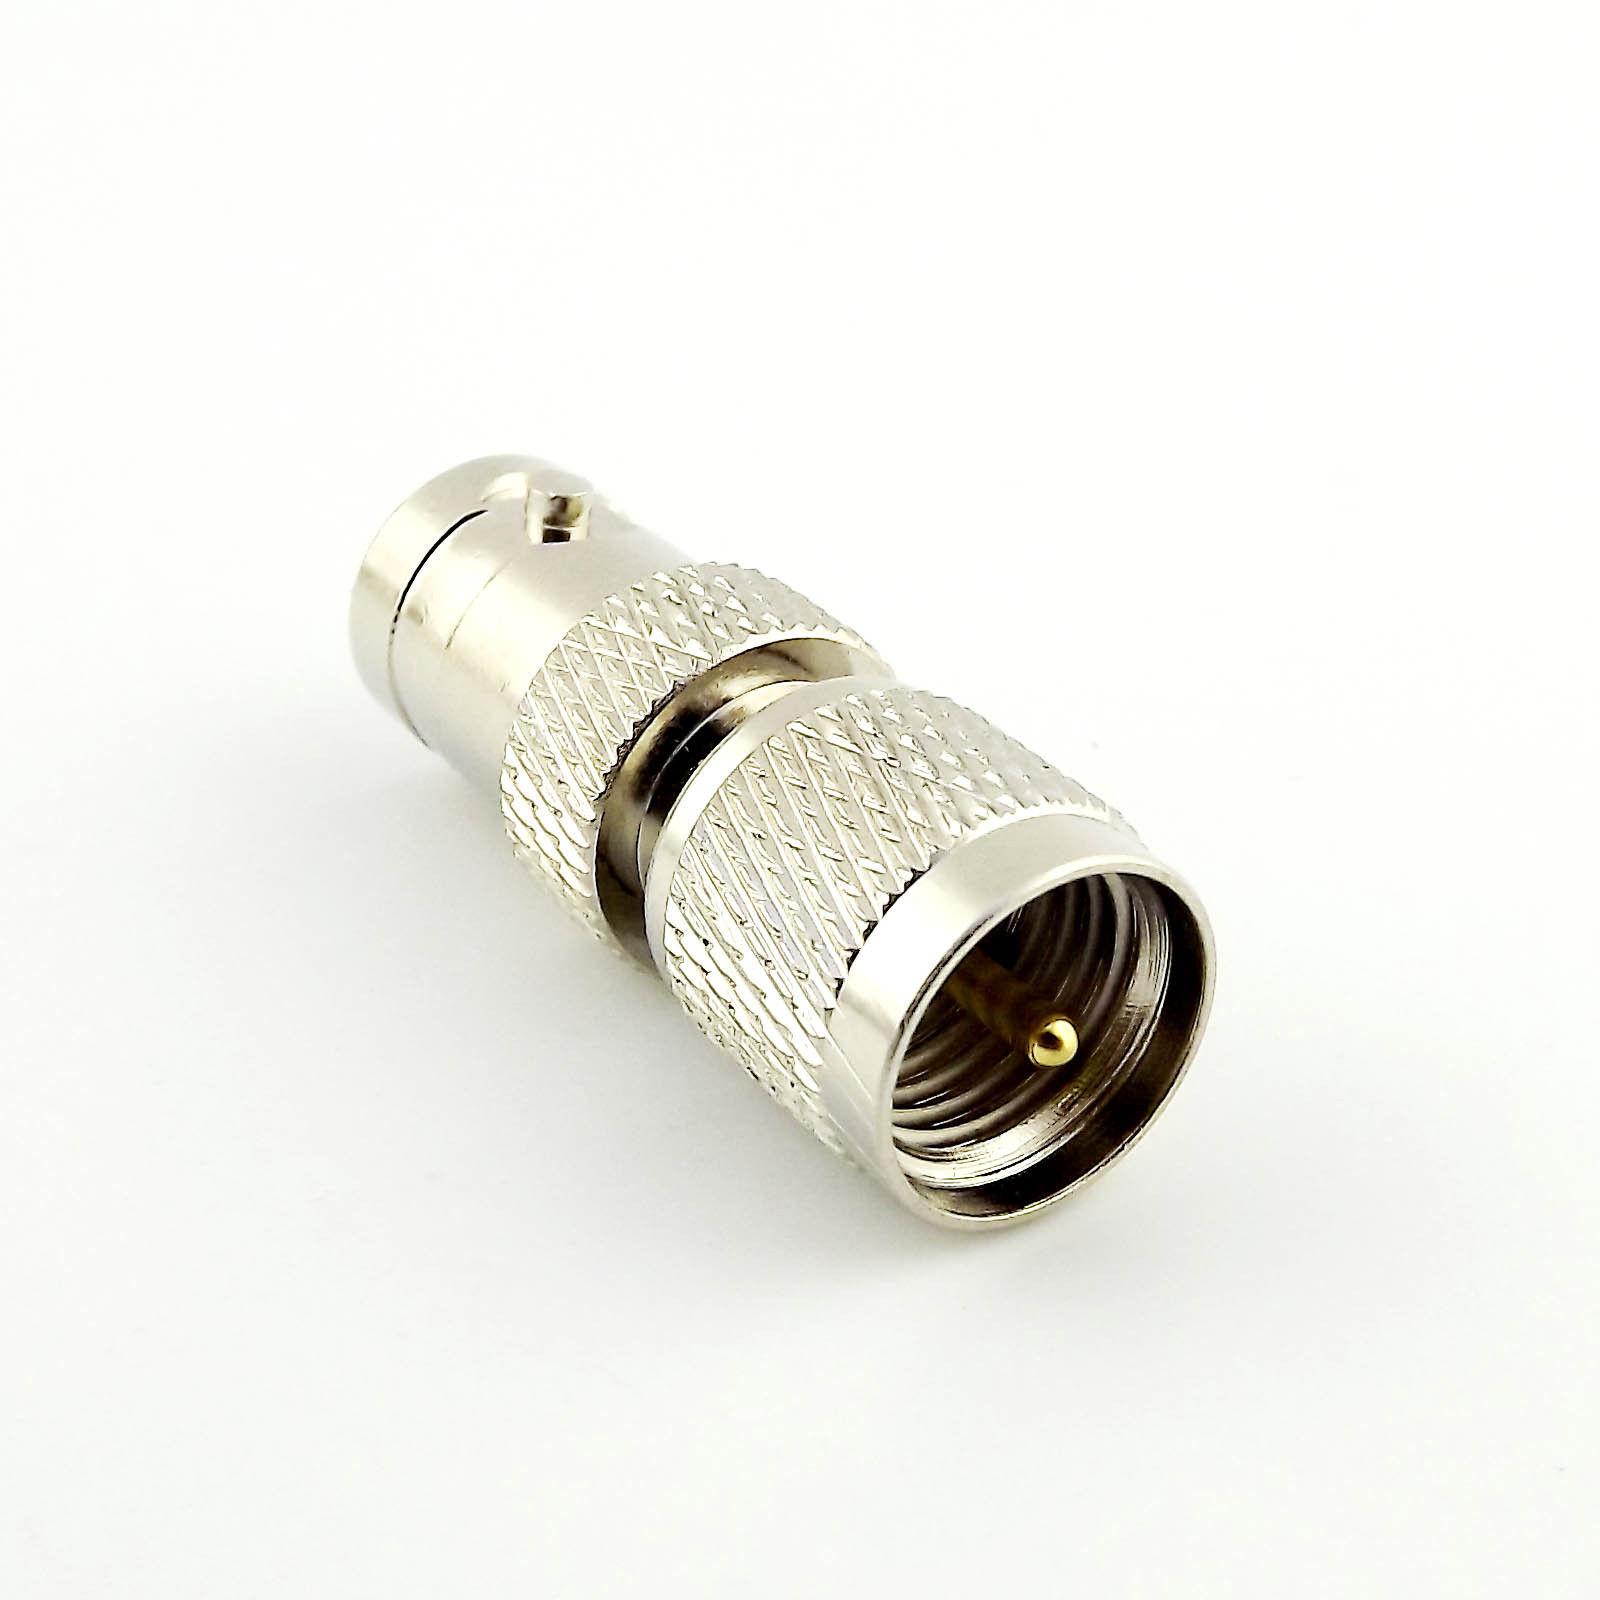 1 x BNC Female to Mini UHF Male Straight RF Connector Adapter CONVERTER USA